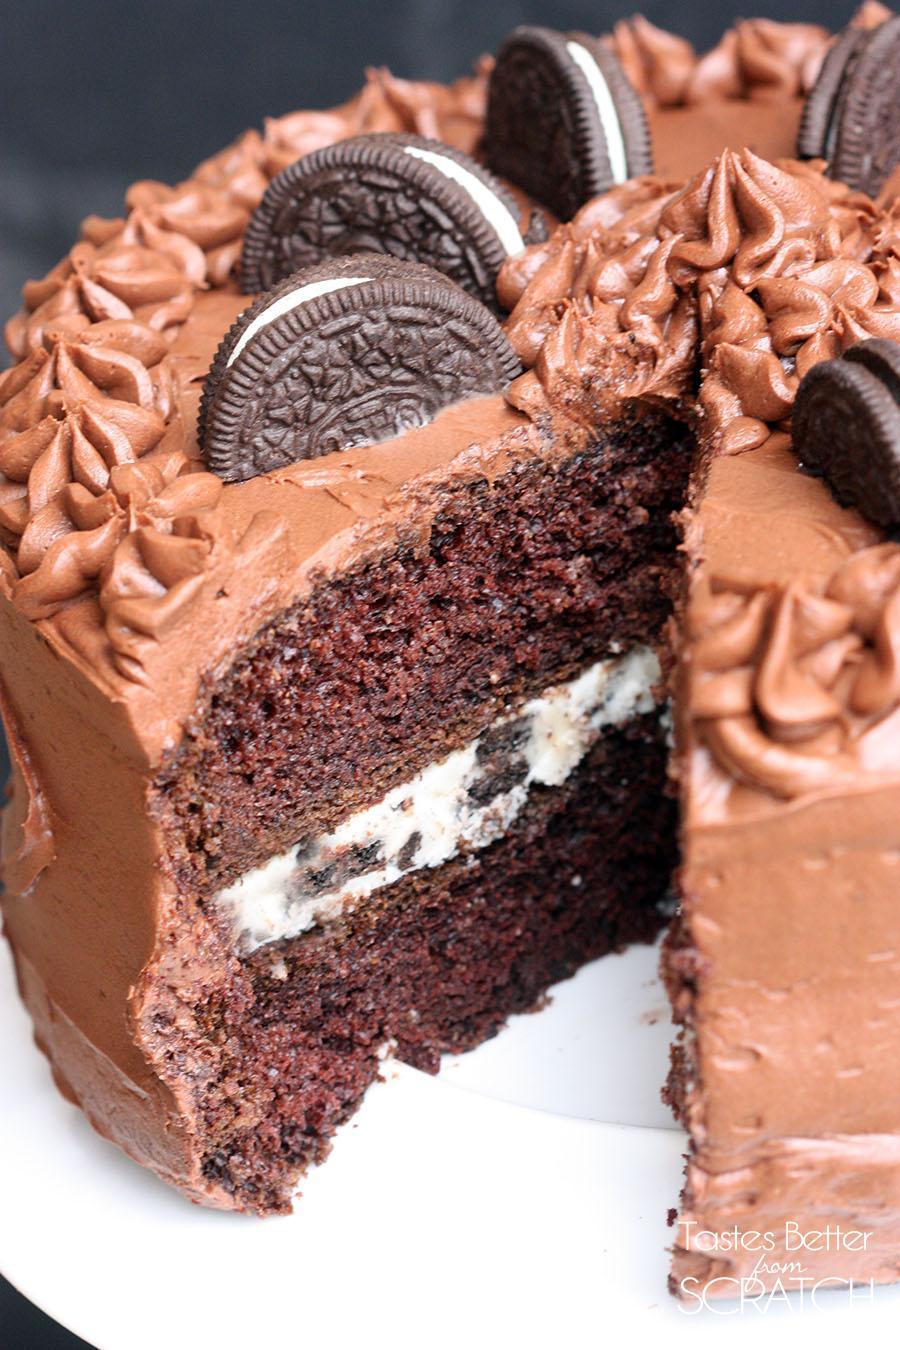 Chocolate Cake Filling  Chocolate Cake with Oreo Cream Filling Tastes Better